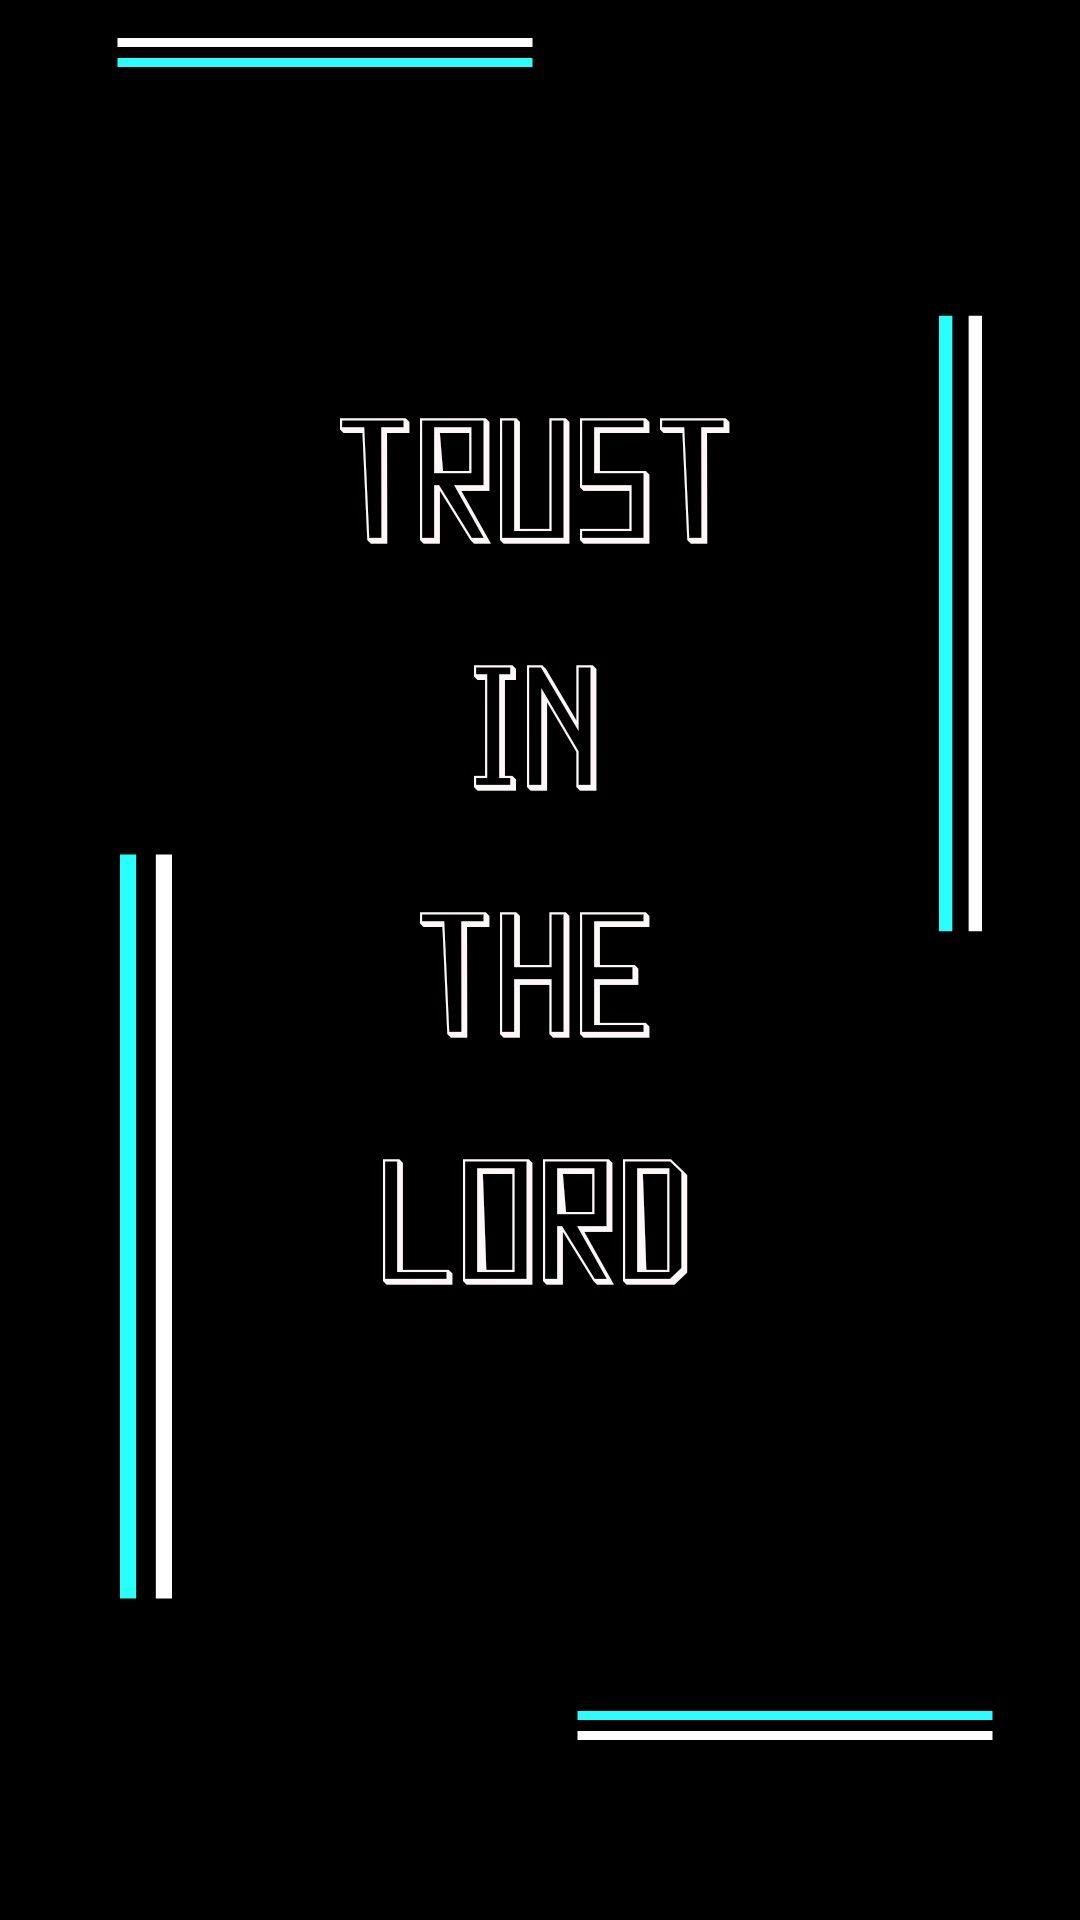 Trust in god trust god lord tech company logos